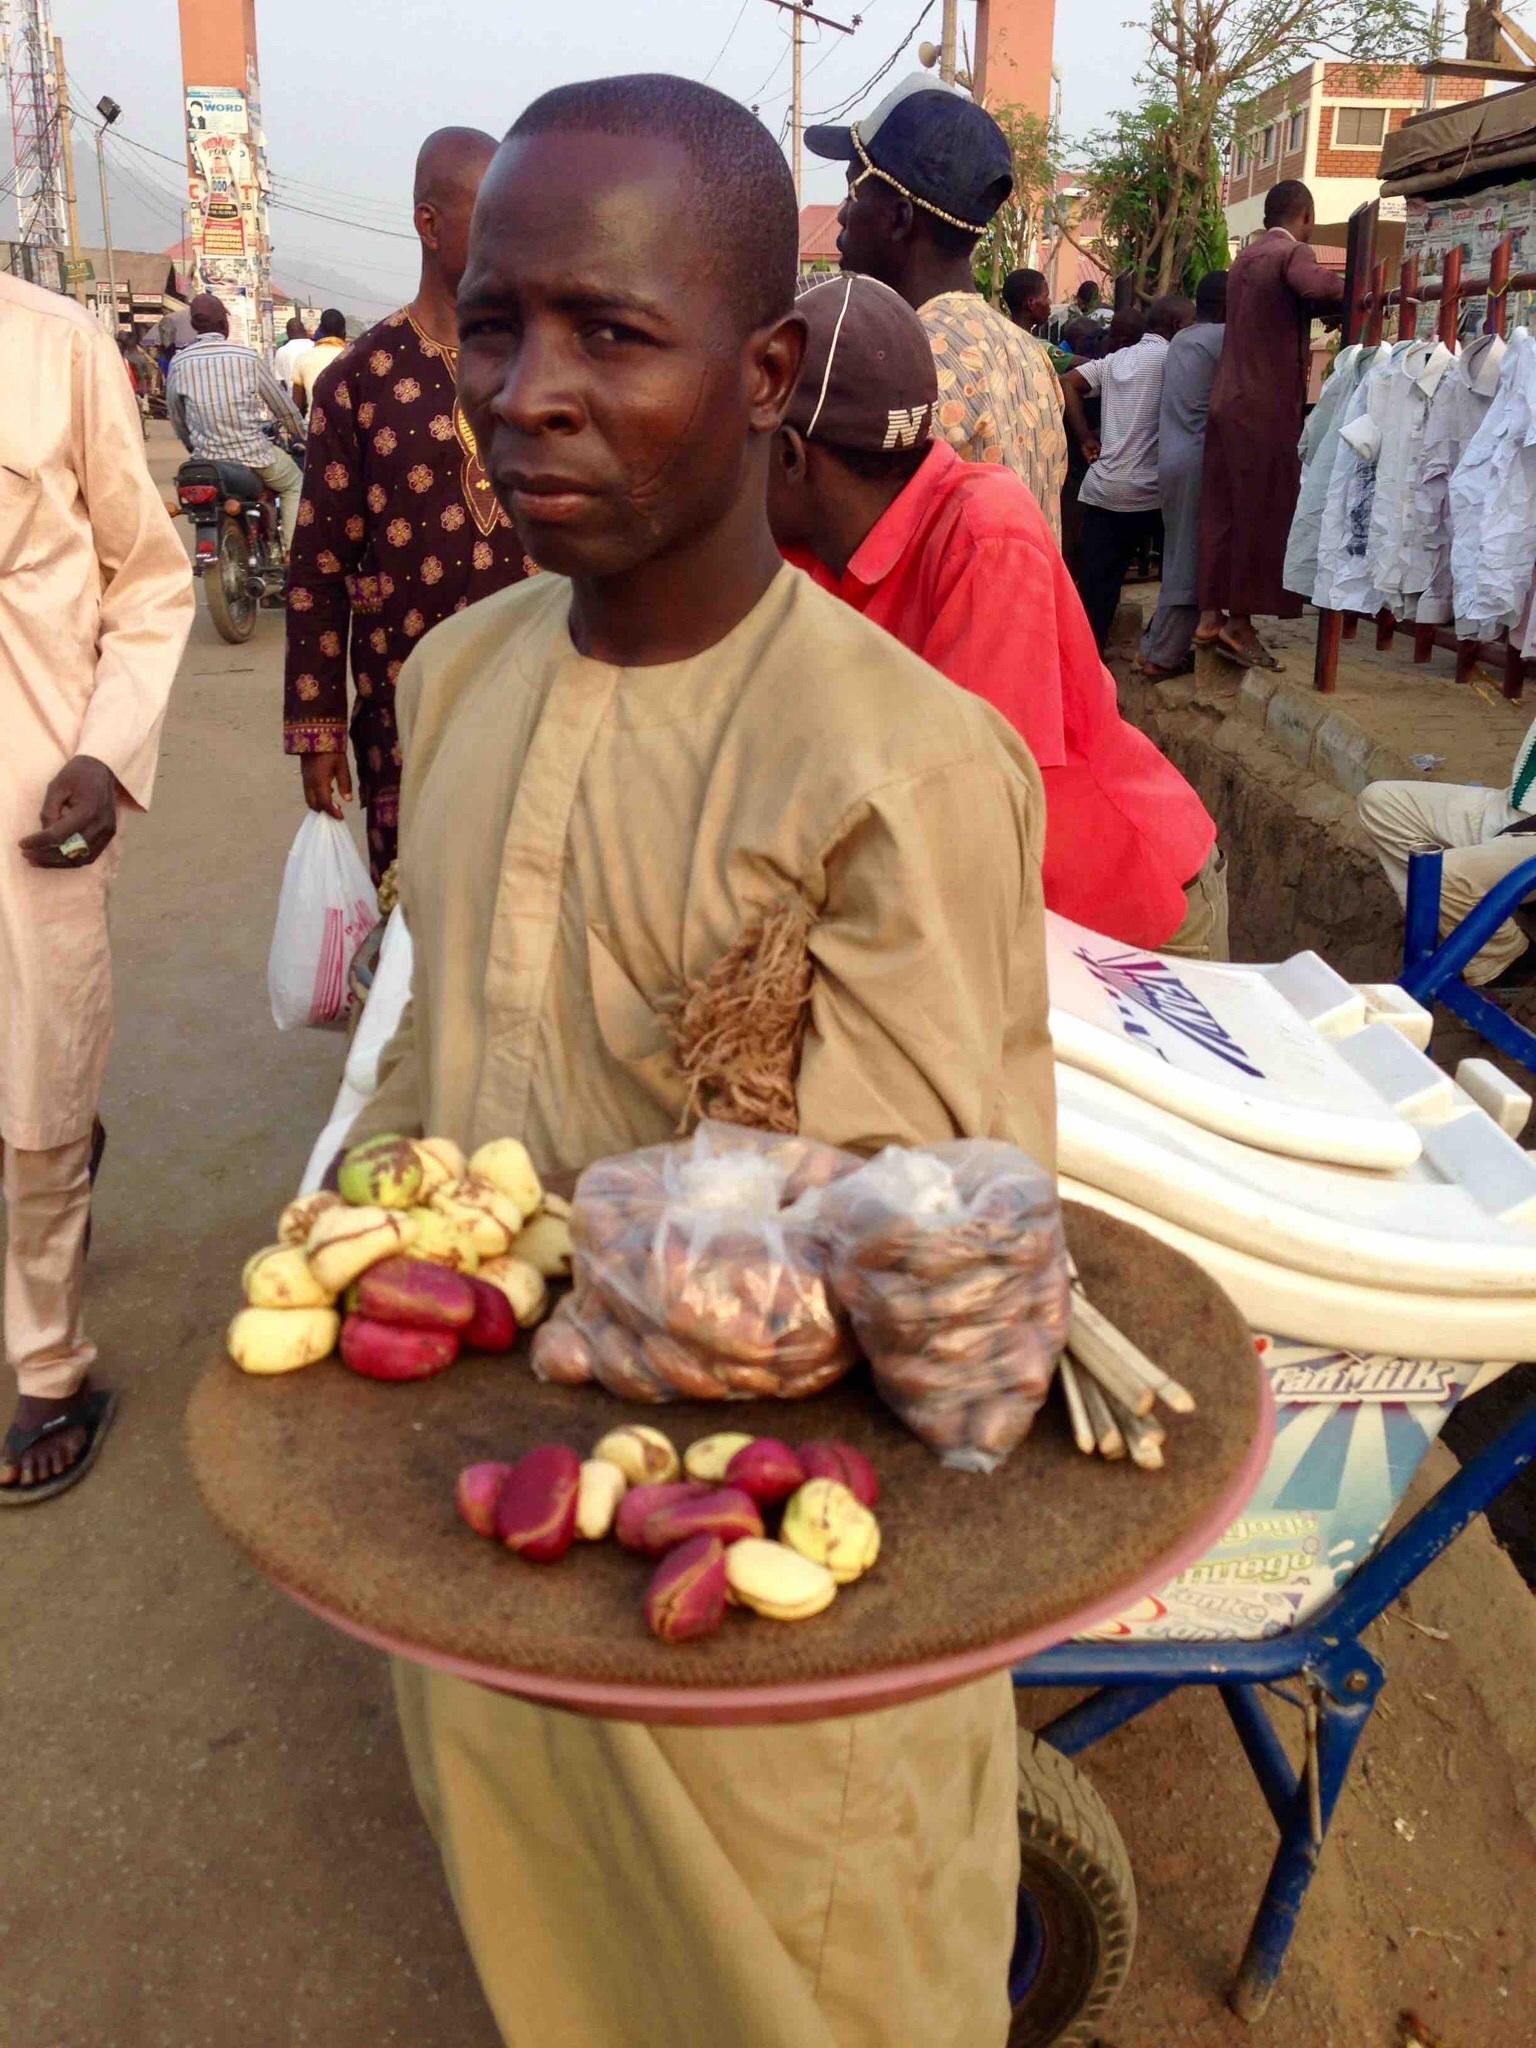 Kola nut hawker, Dutse Alhaji, FCT, Abuja, Nigeria. #JujuFilms